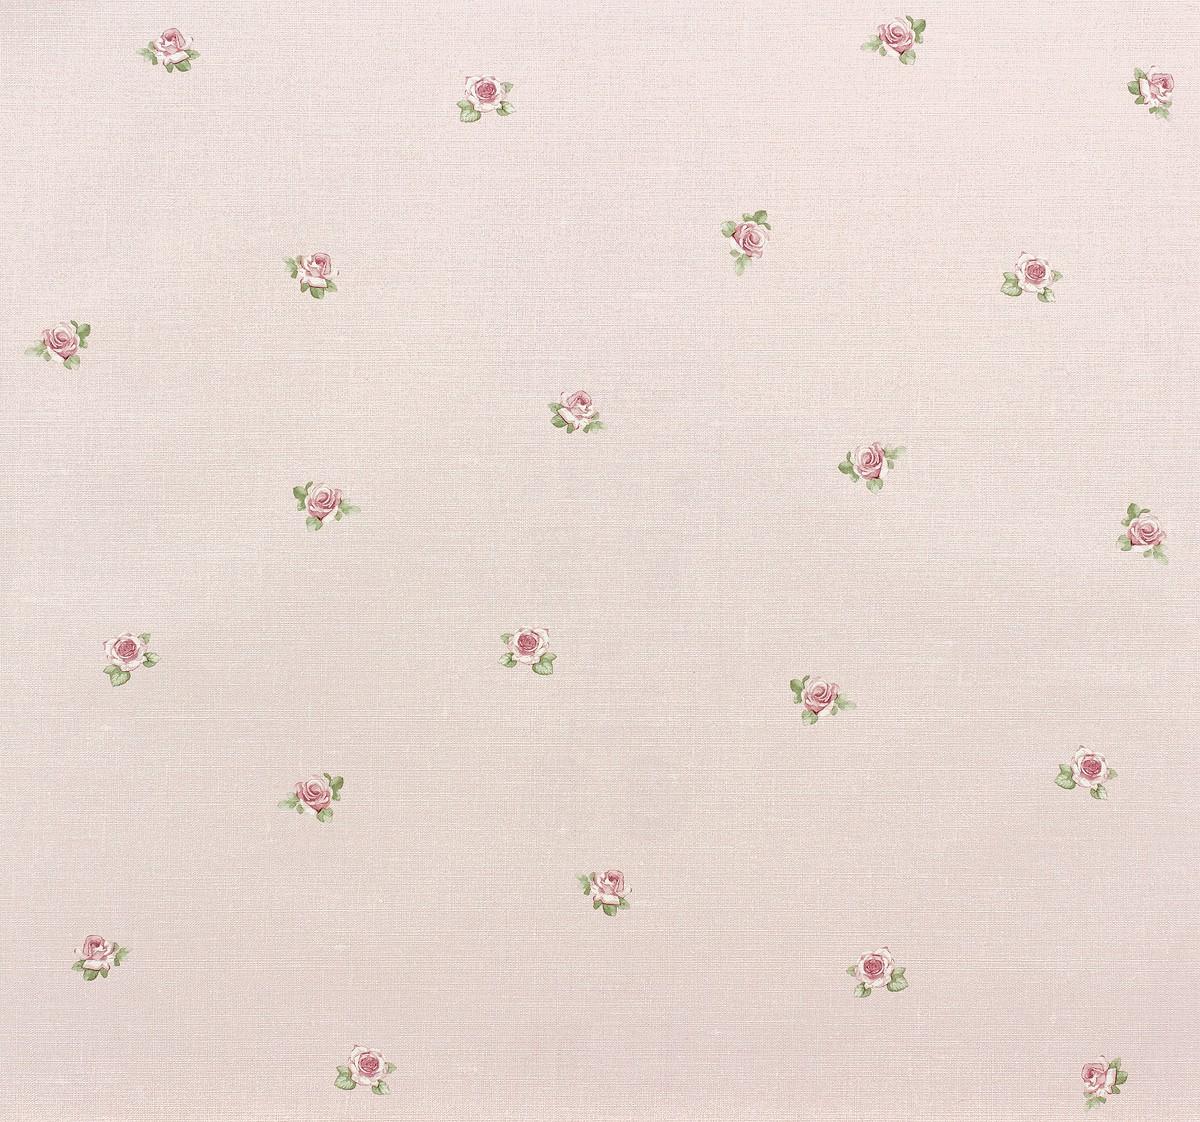 tapete rasch vliestapete lazy sunday 445121 rosa blumen 2. Black Bedroom Furniture Sets. Home Design Ideas